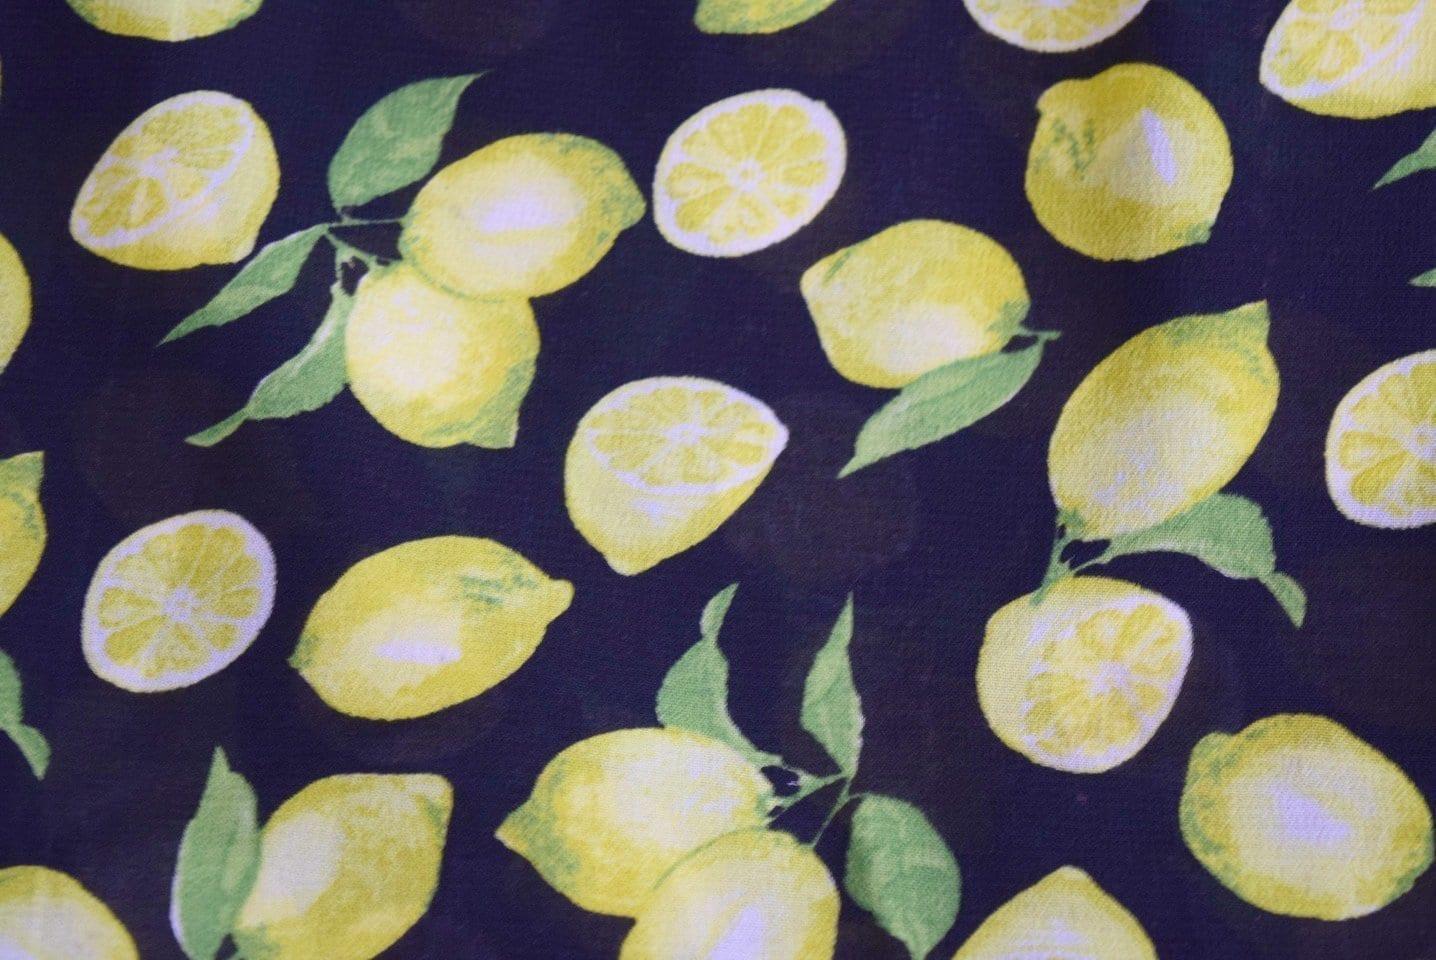 GEORGETTE PRINTED fabric for Kurti, Saree, Salwar, Dupatta GF031 1